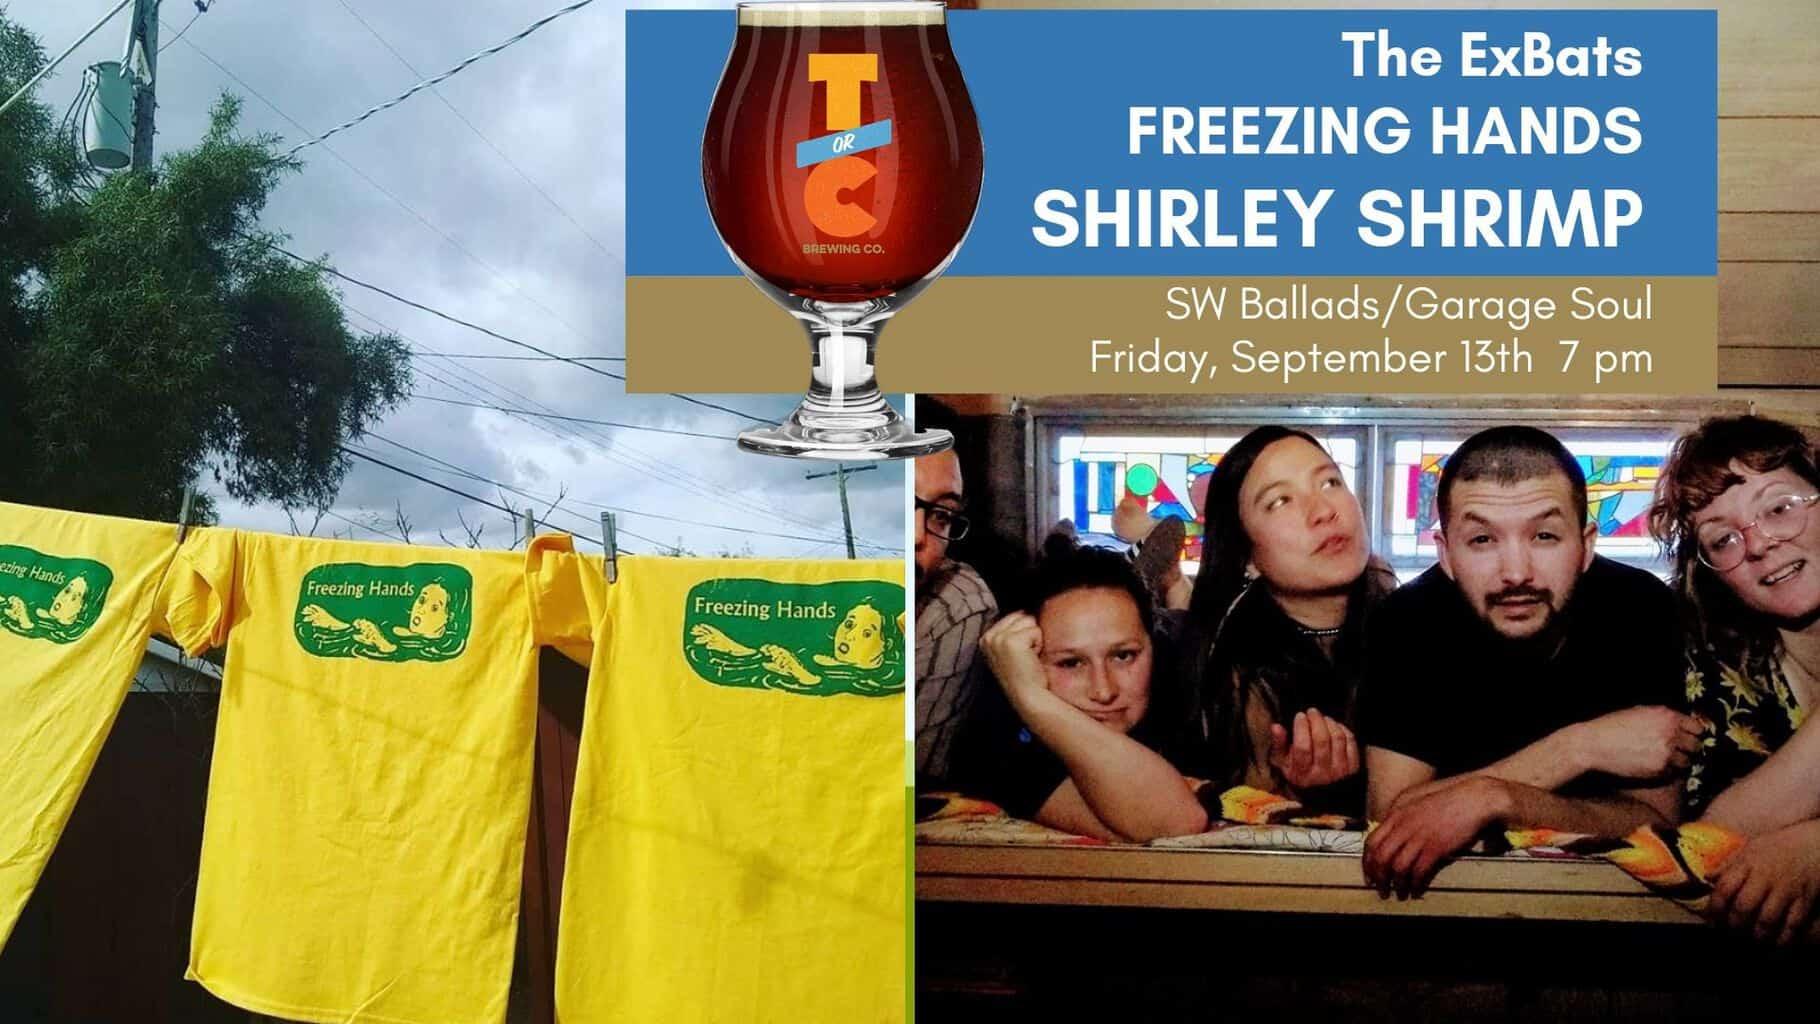 Shirley Shrimp, Freezing Hands & The ExBats